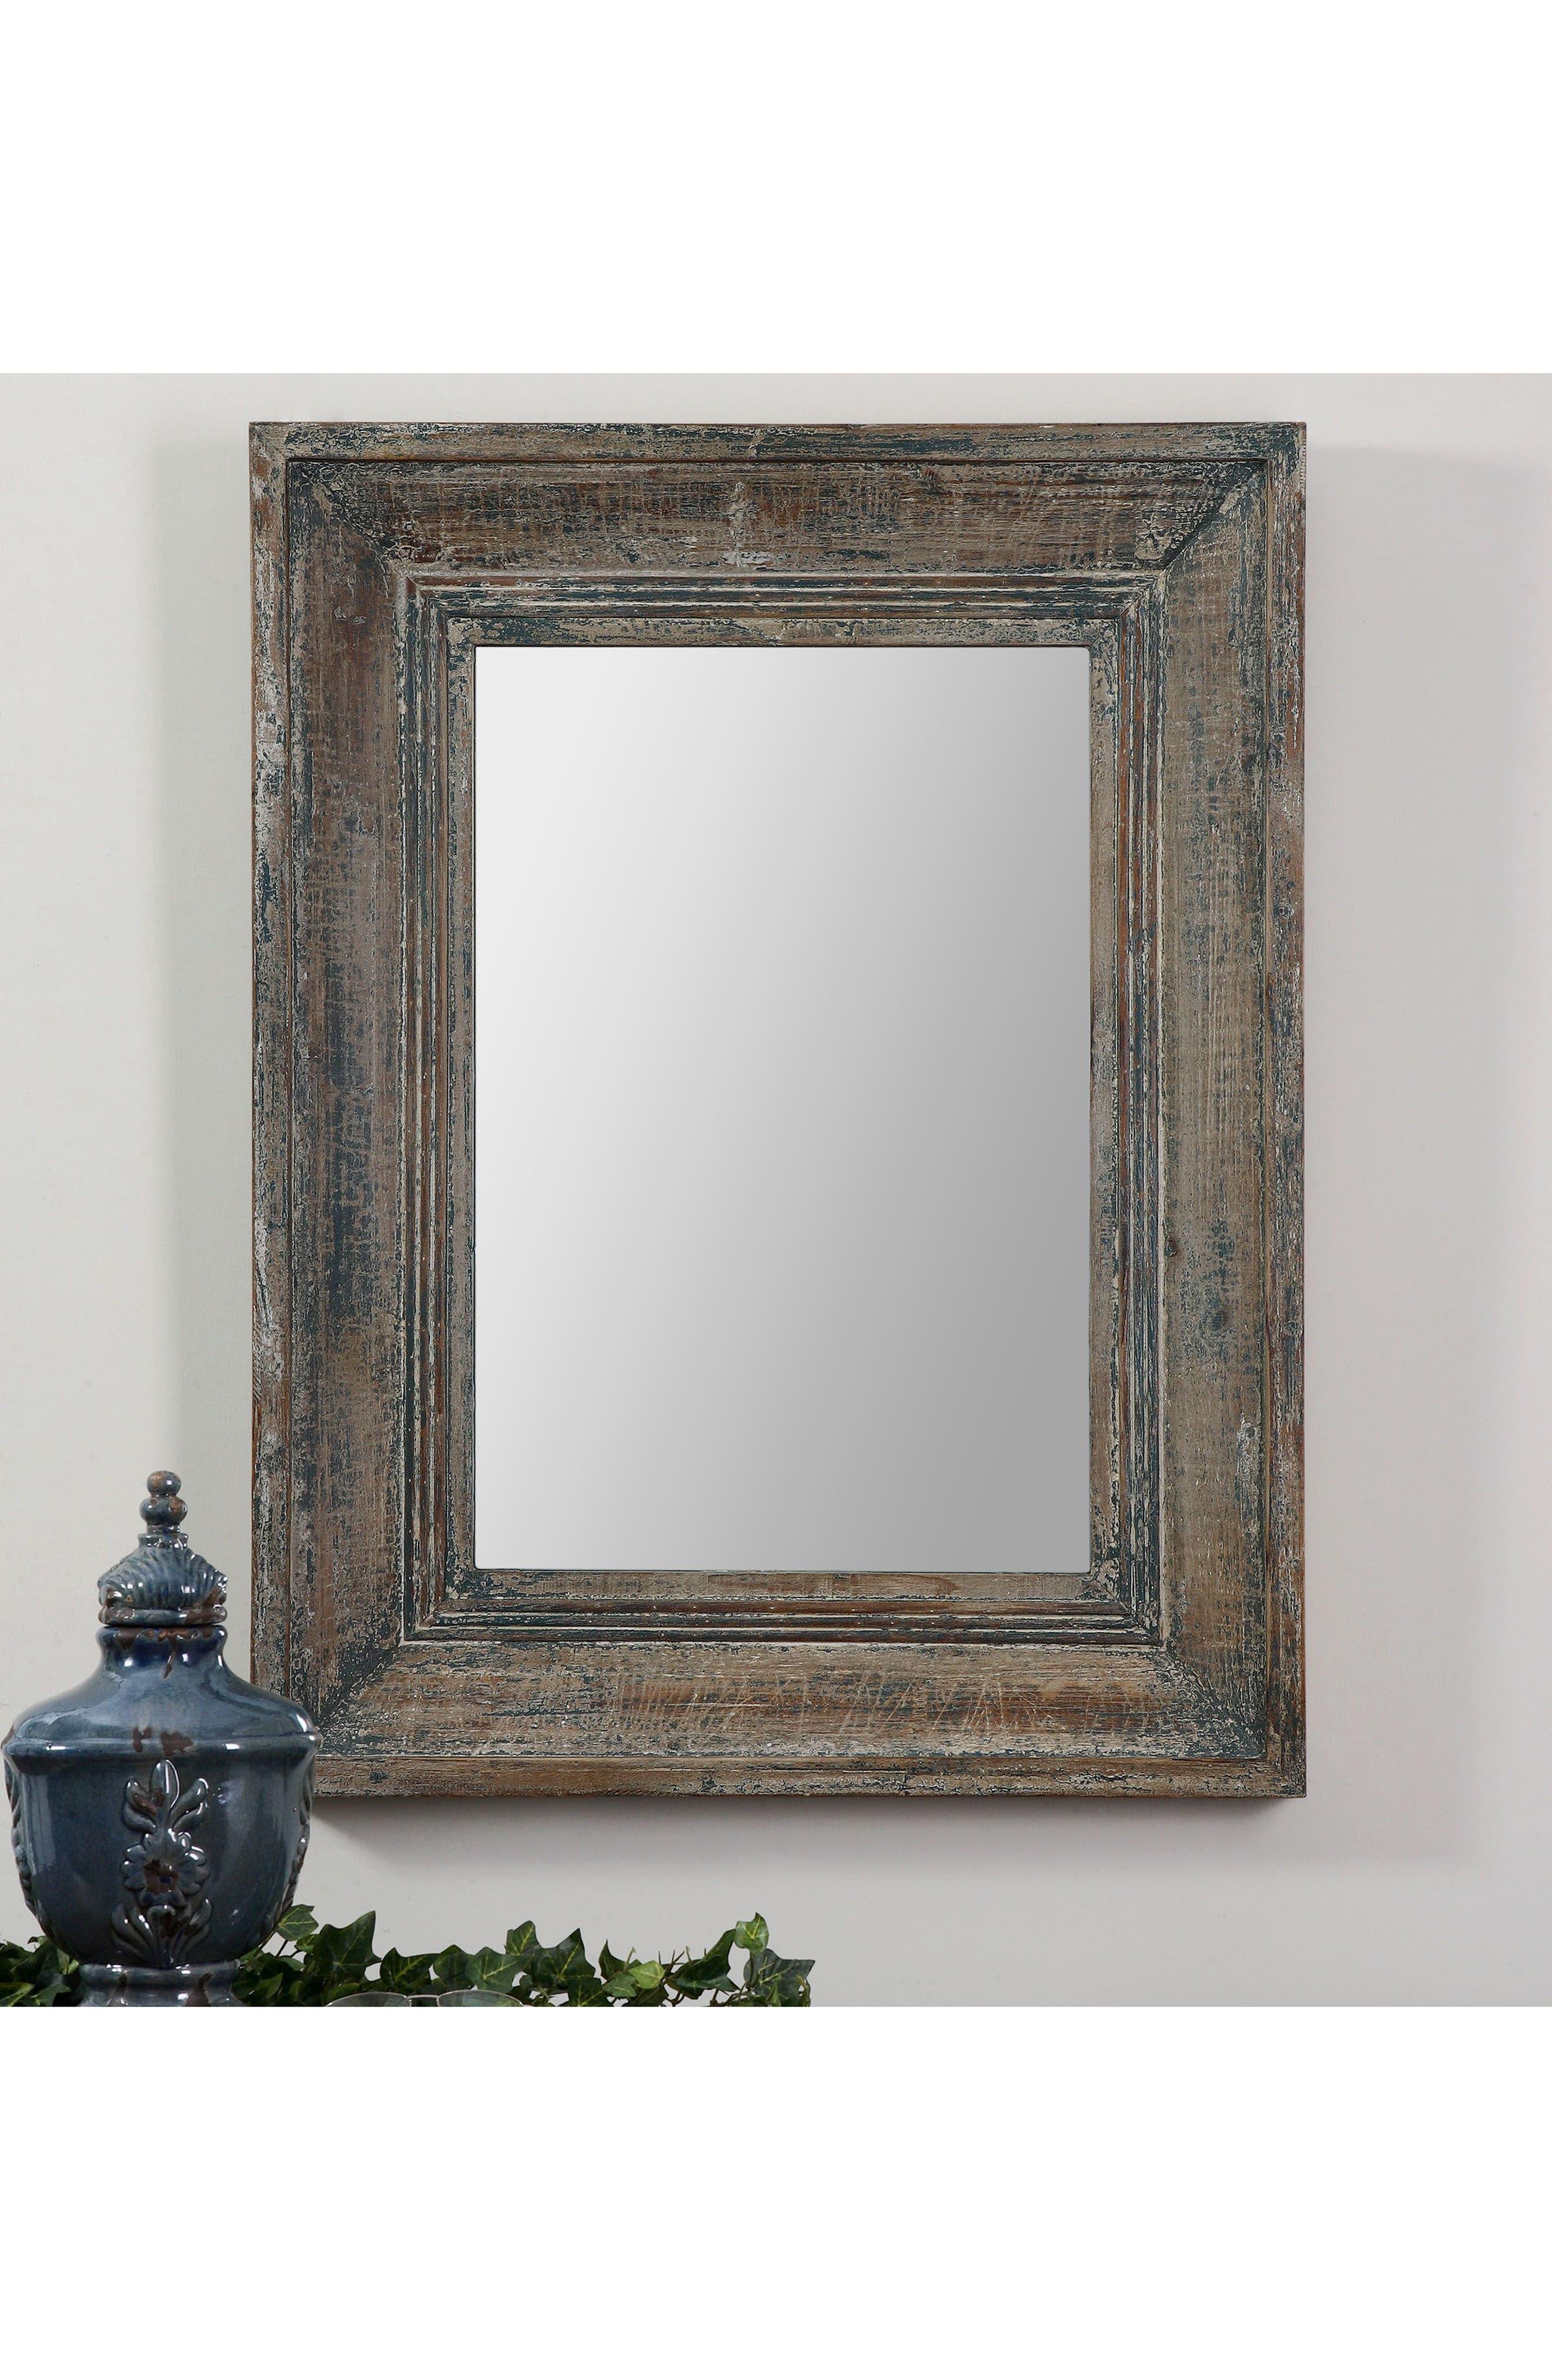 Missoula Small Wall Mirror,                             Alternate thumbnail 2, color,                             200